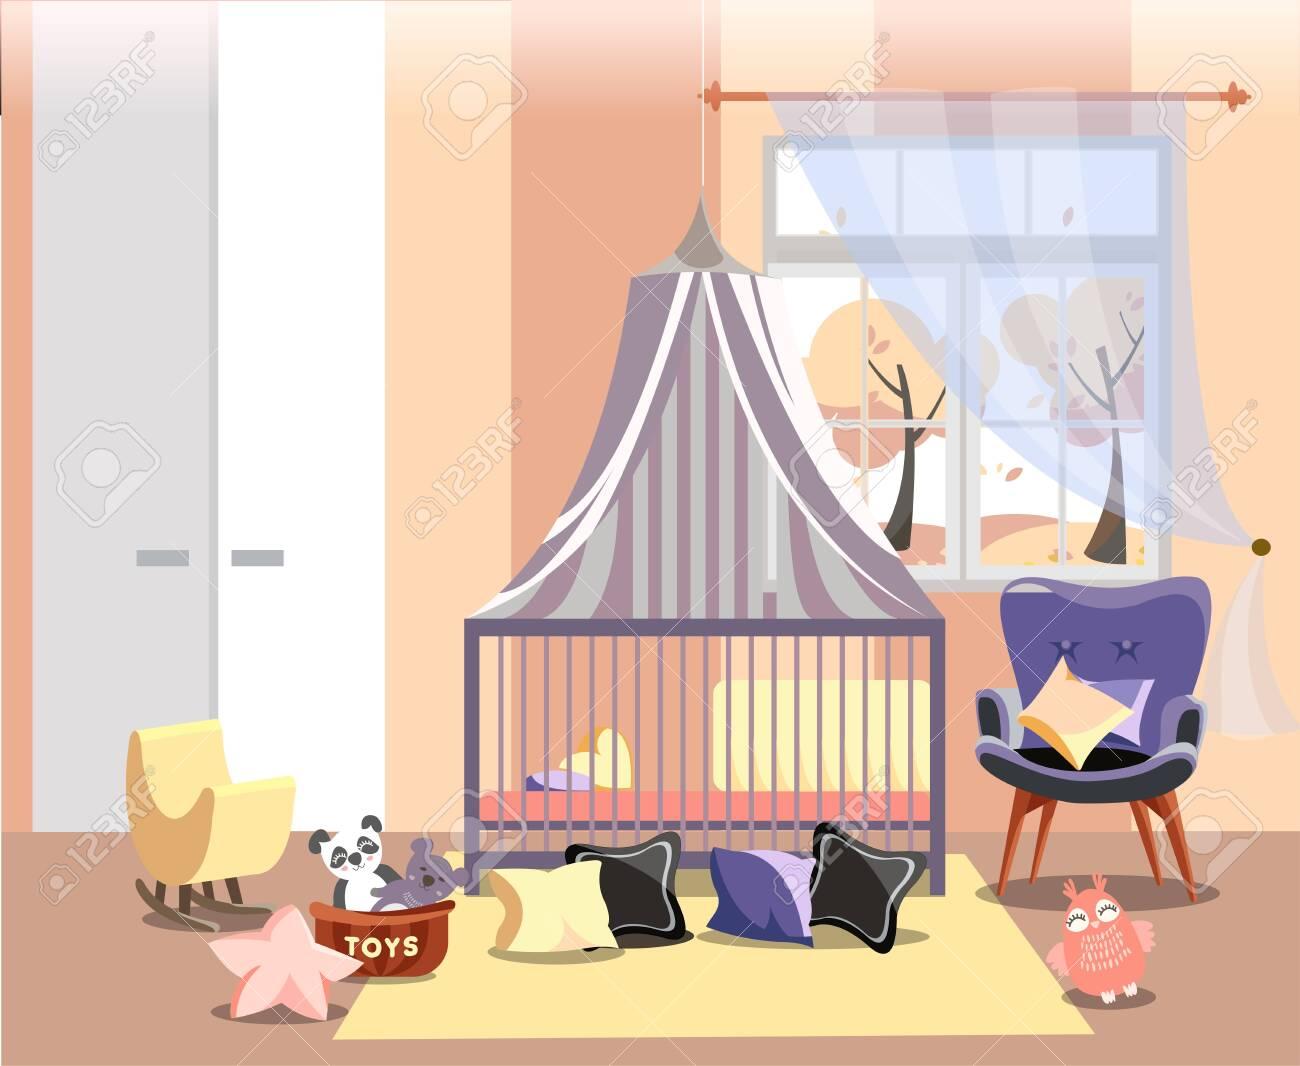 Image of: Newborn Kid Or Nursery Room Interior Flat Vector Illustration Royalty Free Cliparts Vectors And Stock Illustration Image 122003051